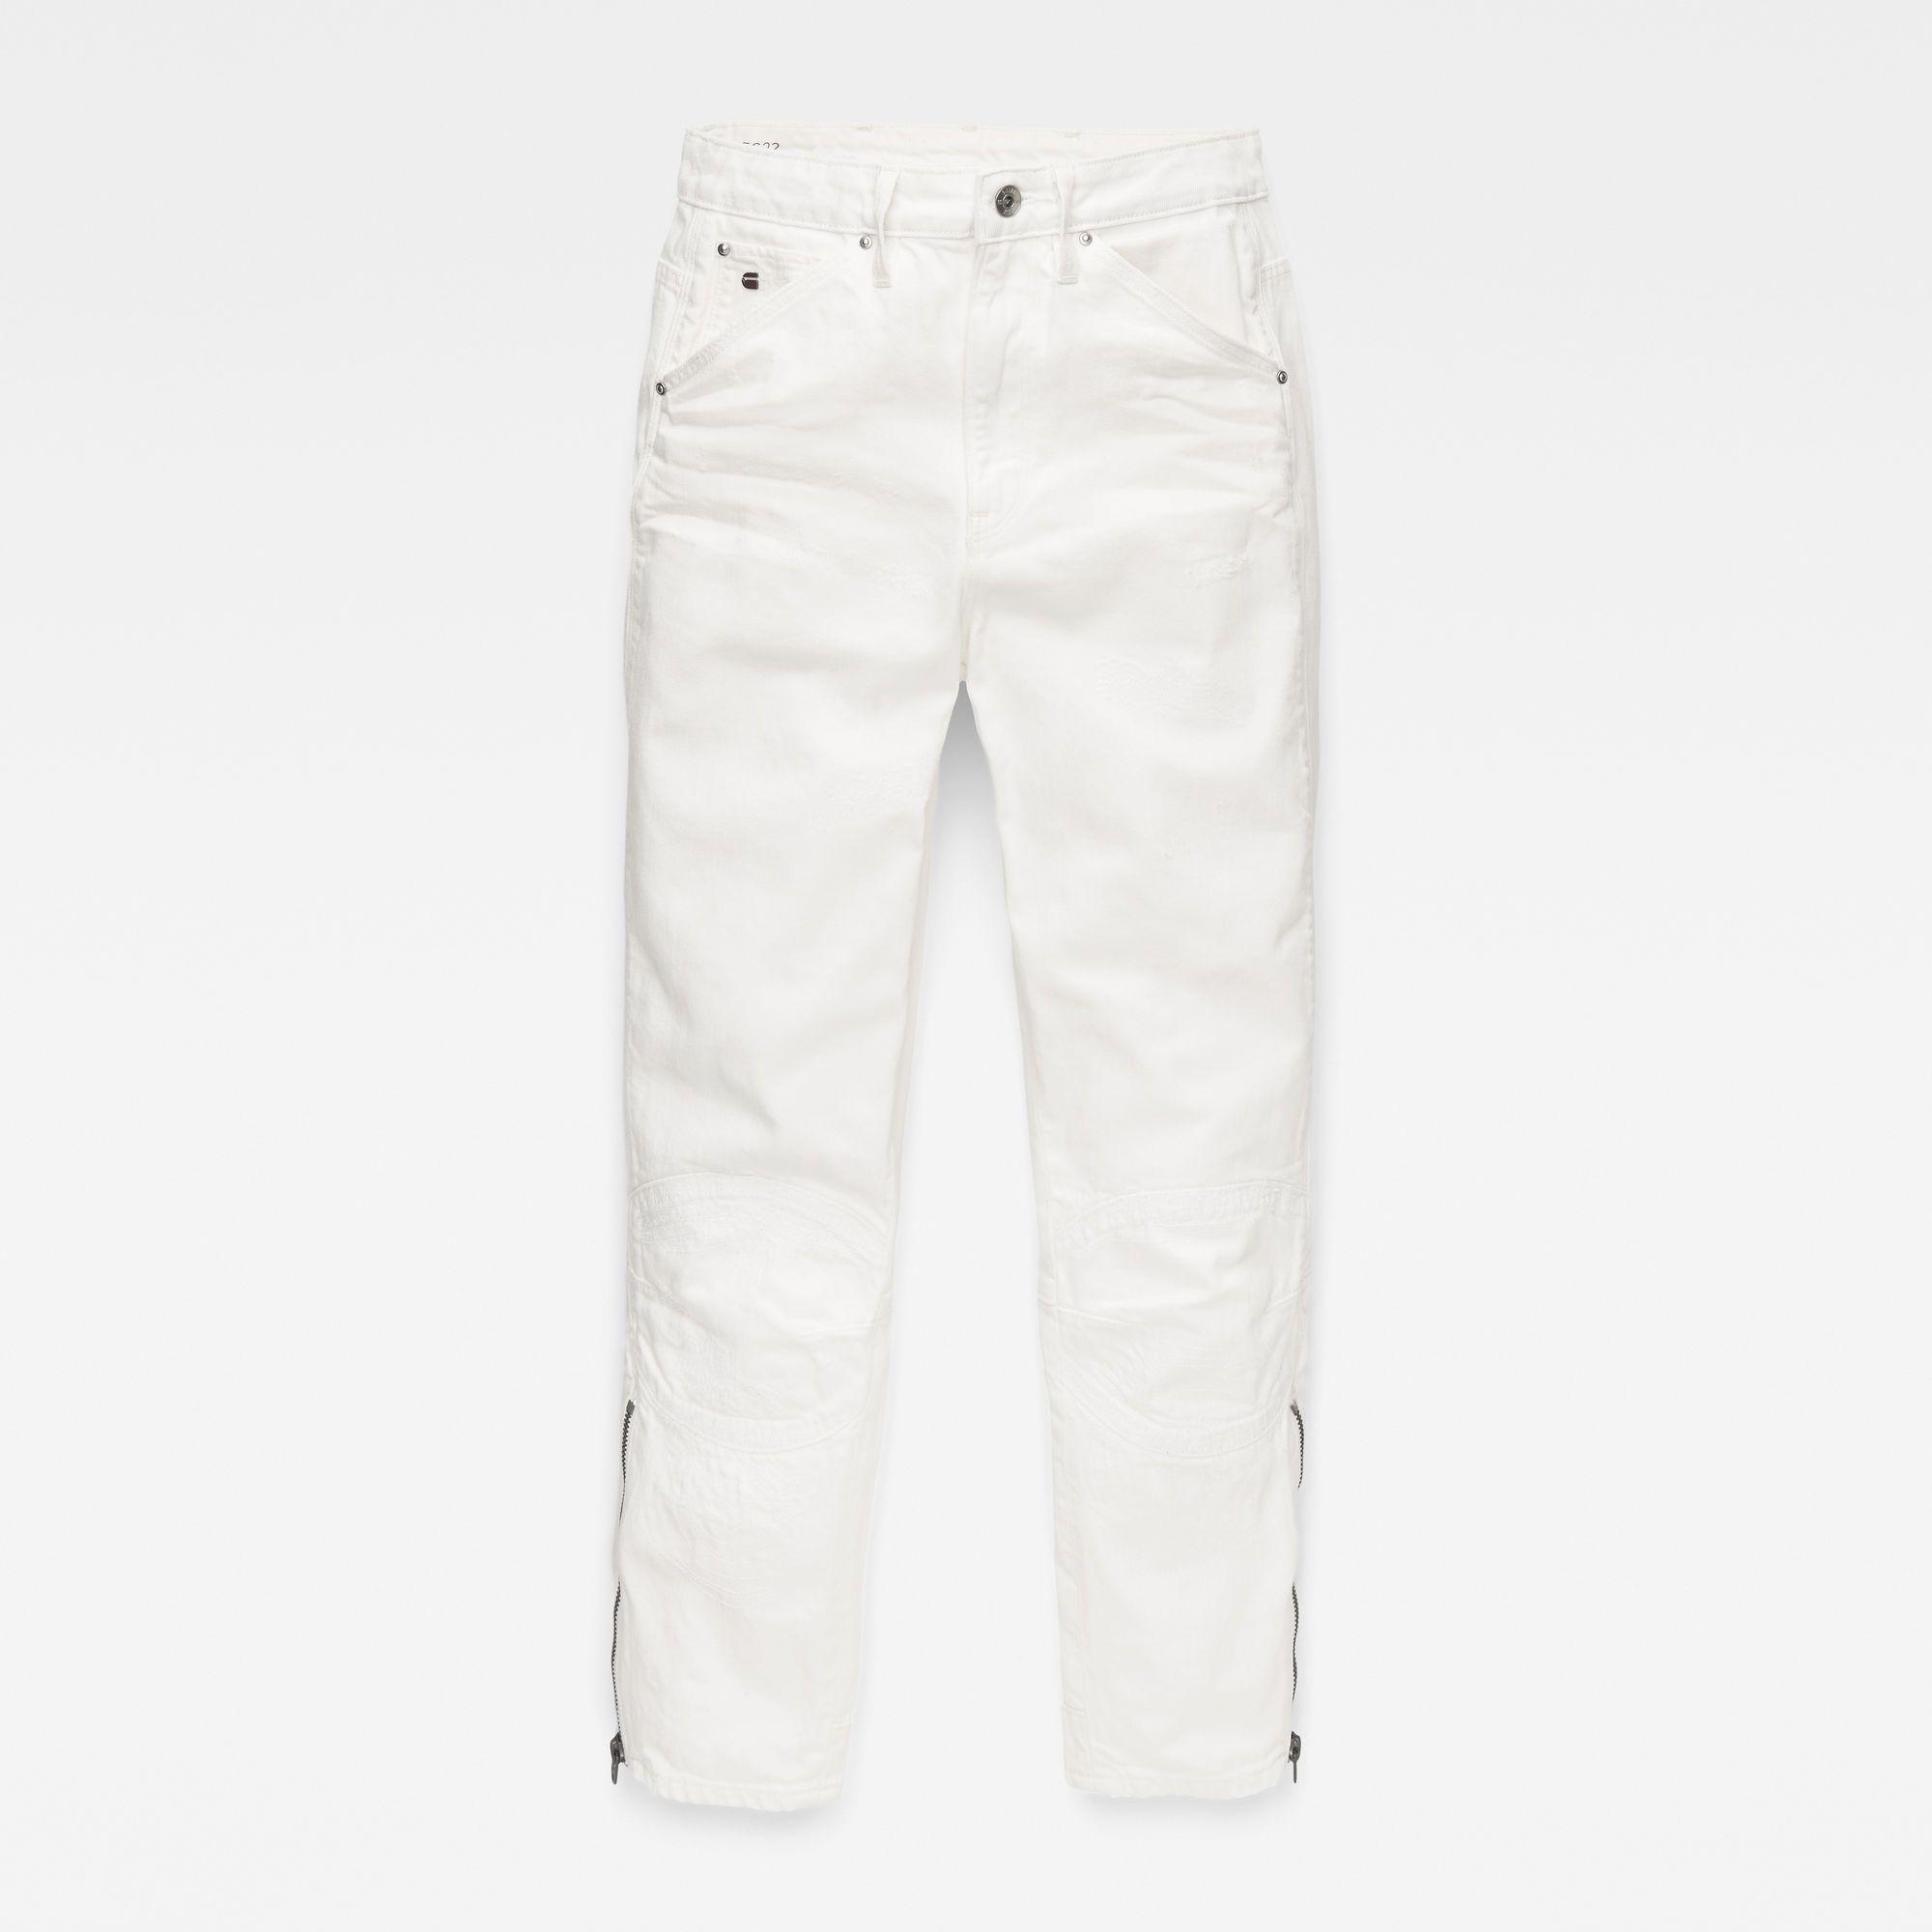 G-Star RAW Raw Essentials 5622 Ultra High Waist Straight 7/8 Jeans